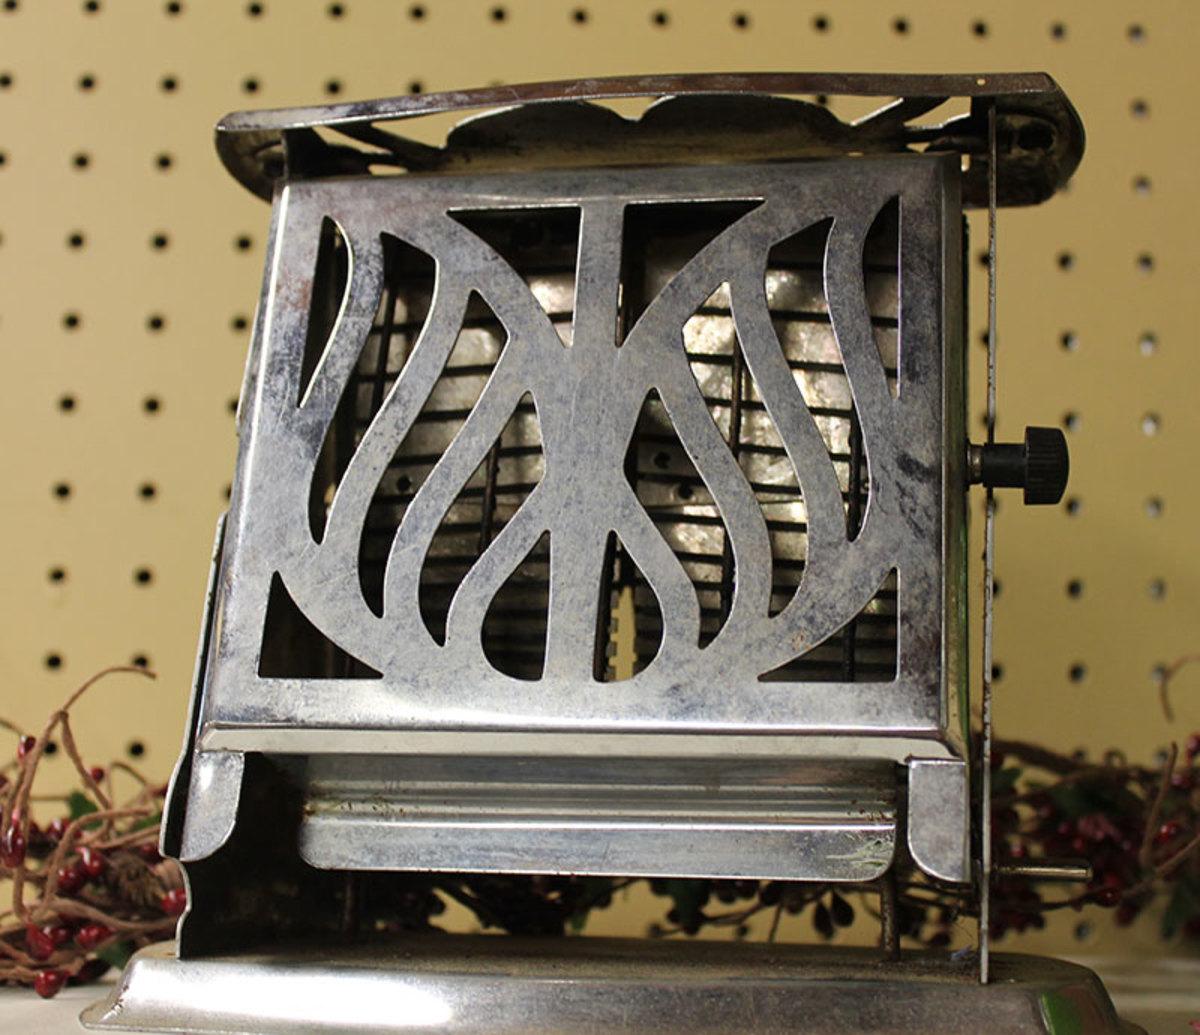 Vintage Electric toaster